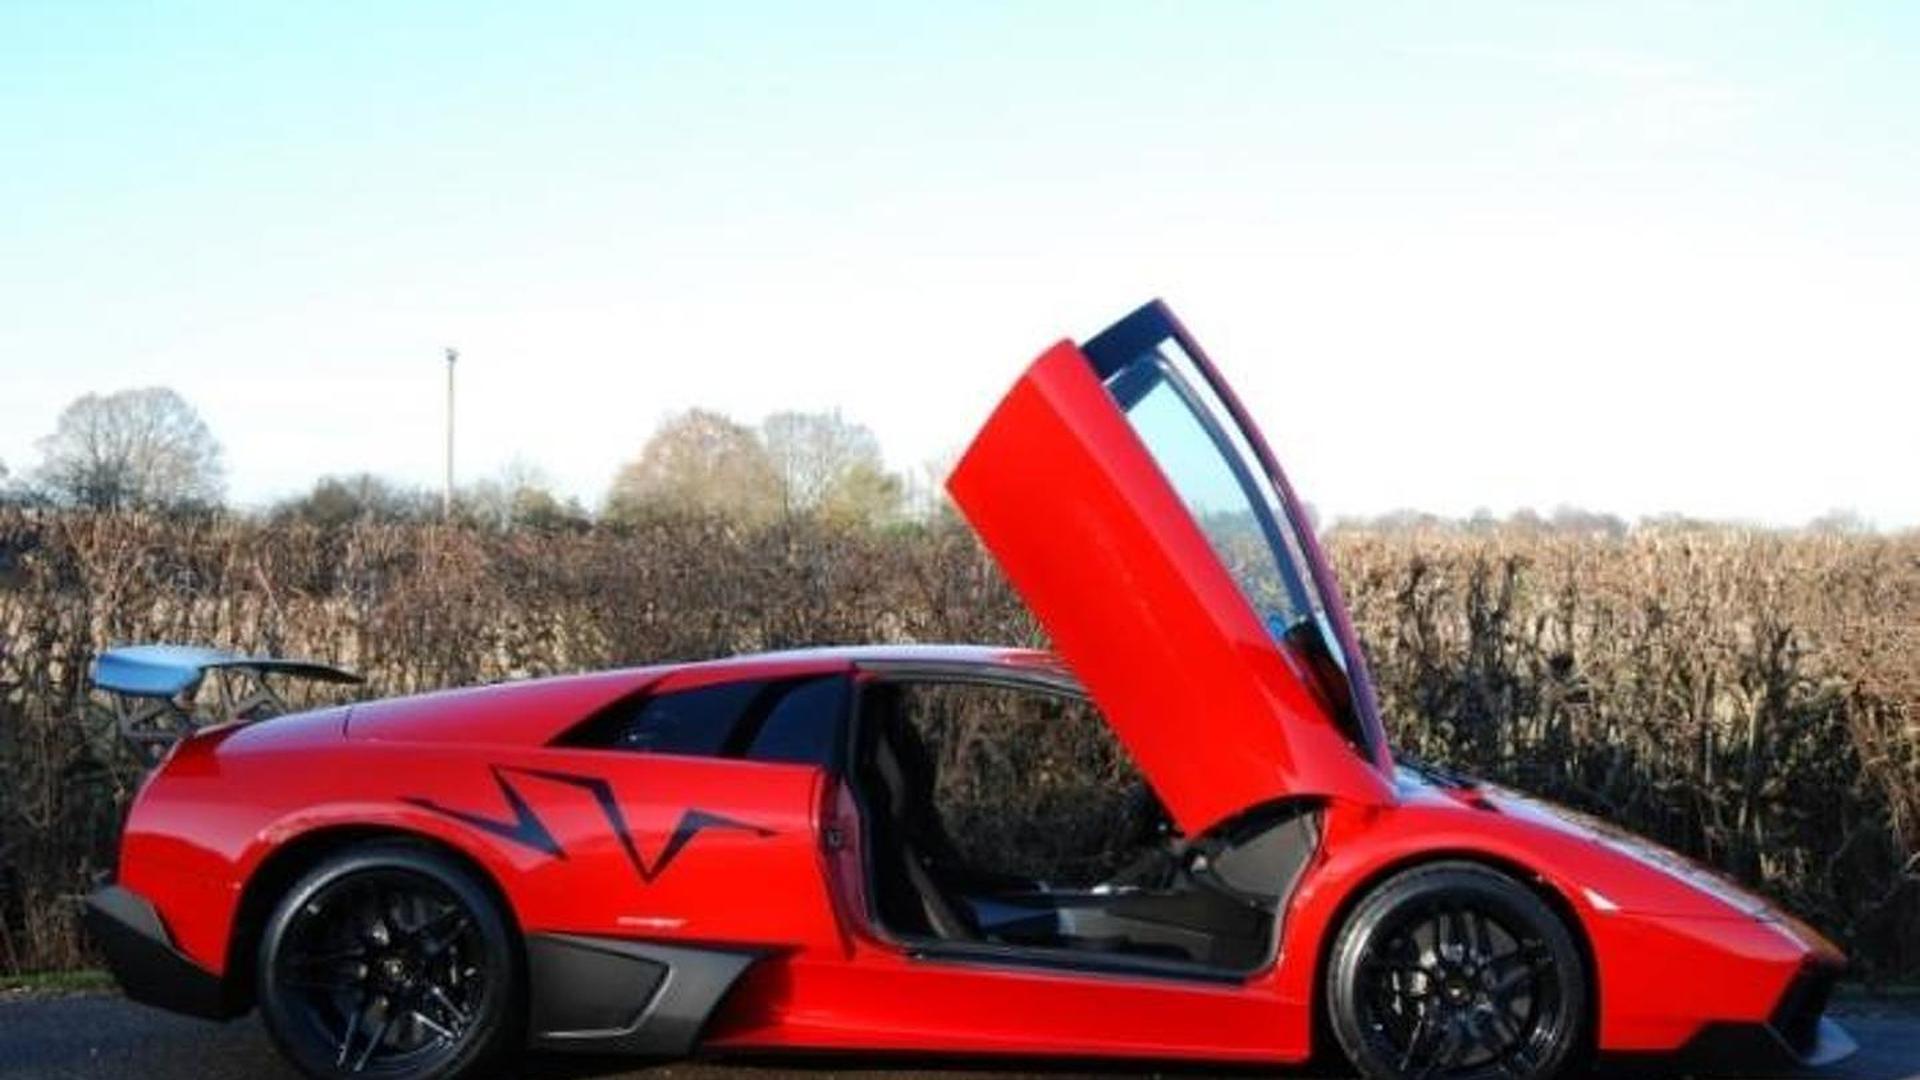 Low-mileage Lamborghini Murcielago SV Rosso Mars up for grabs in UK